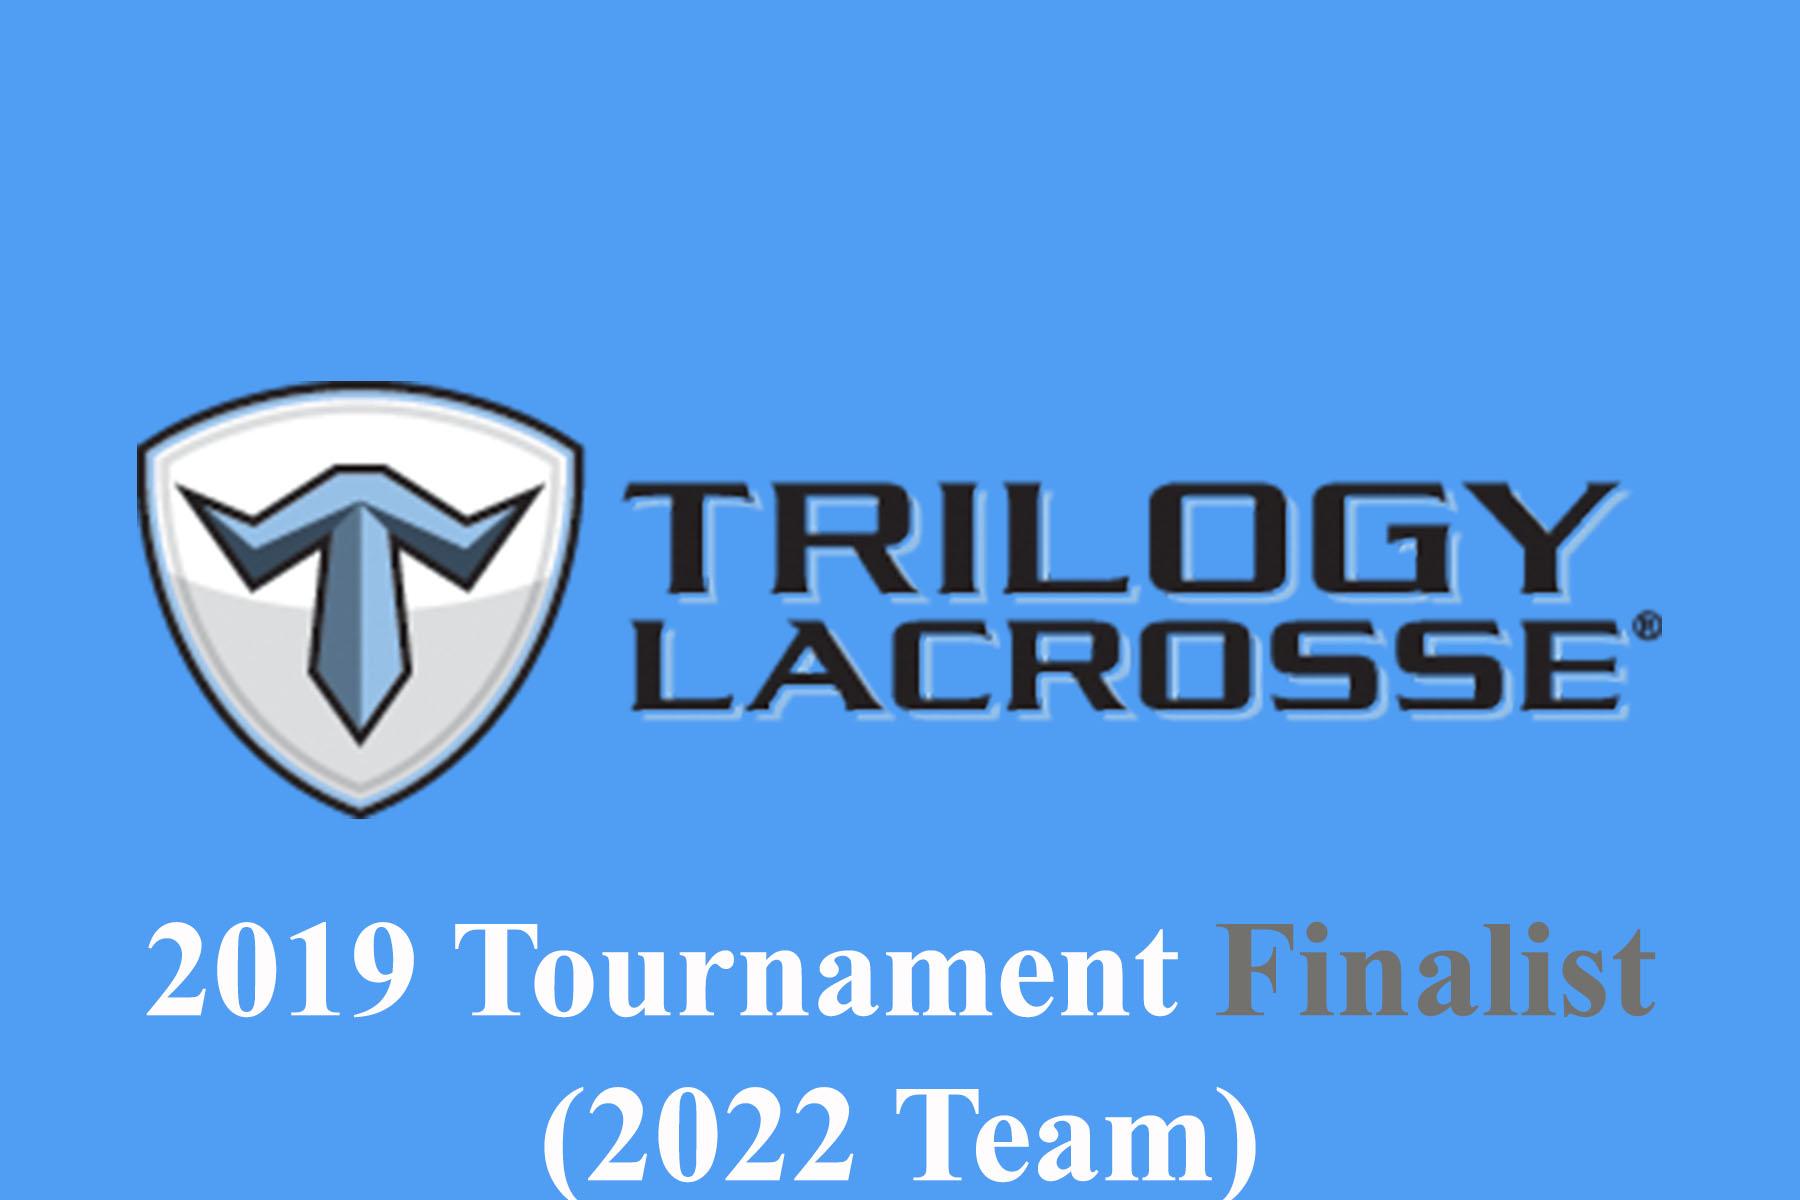 Trilogy 24 2019 Finalist 2022